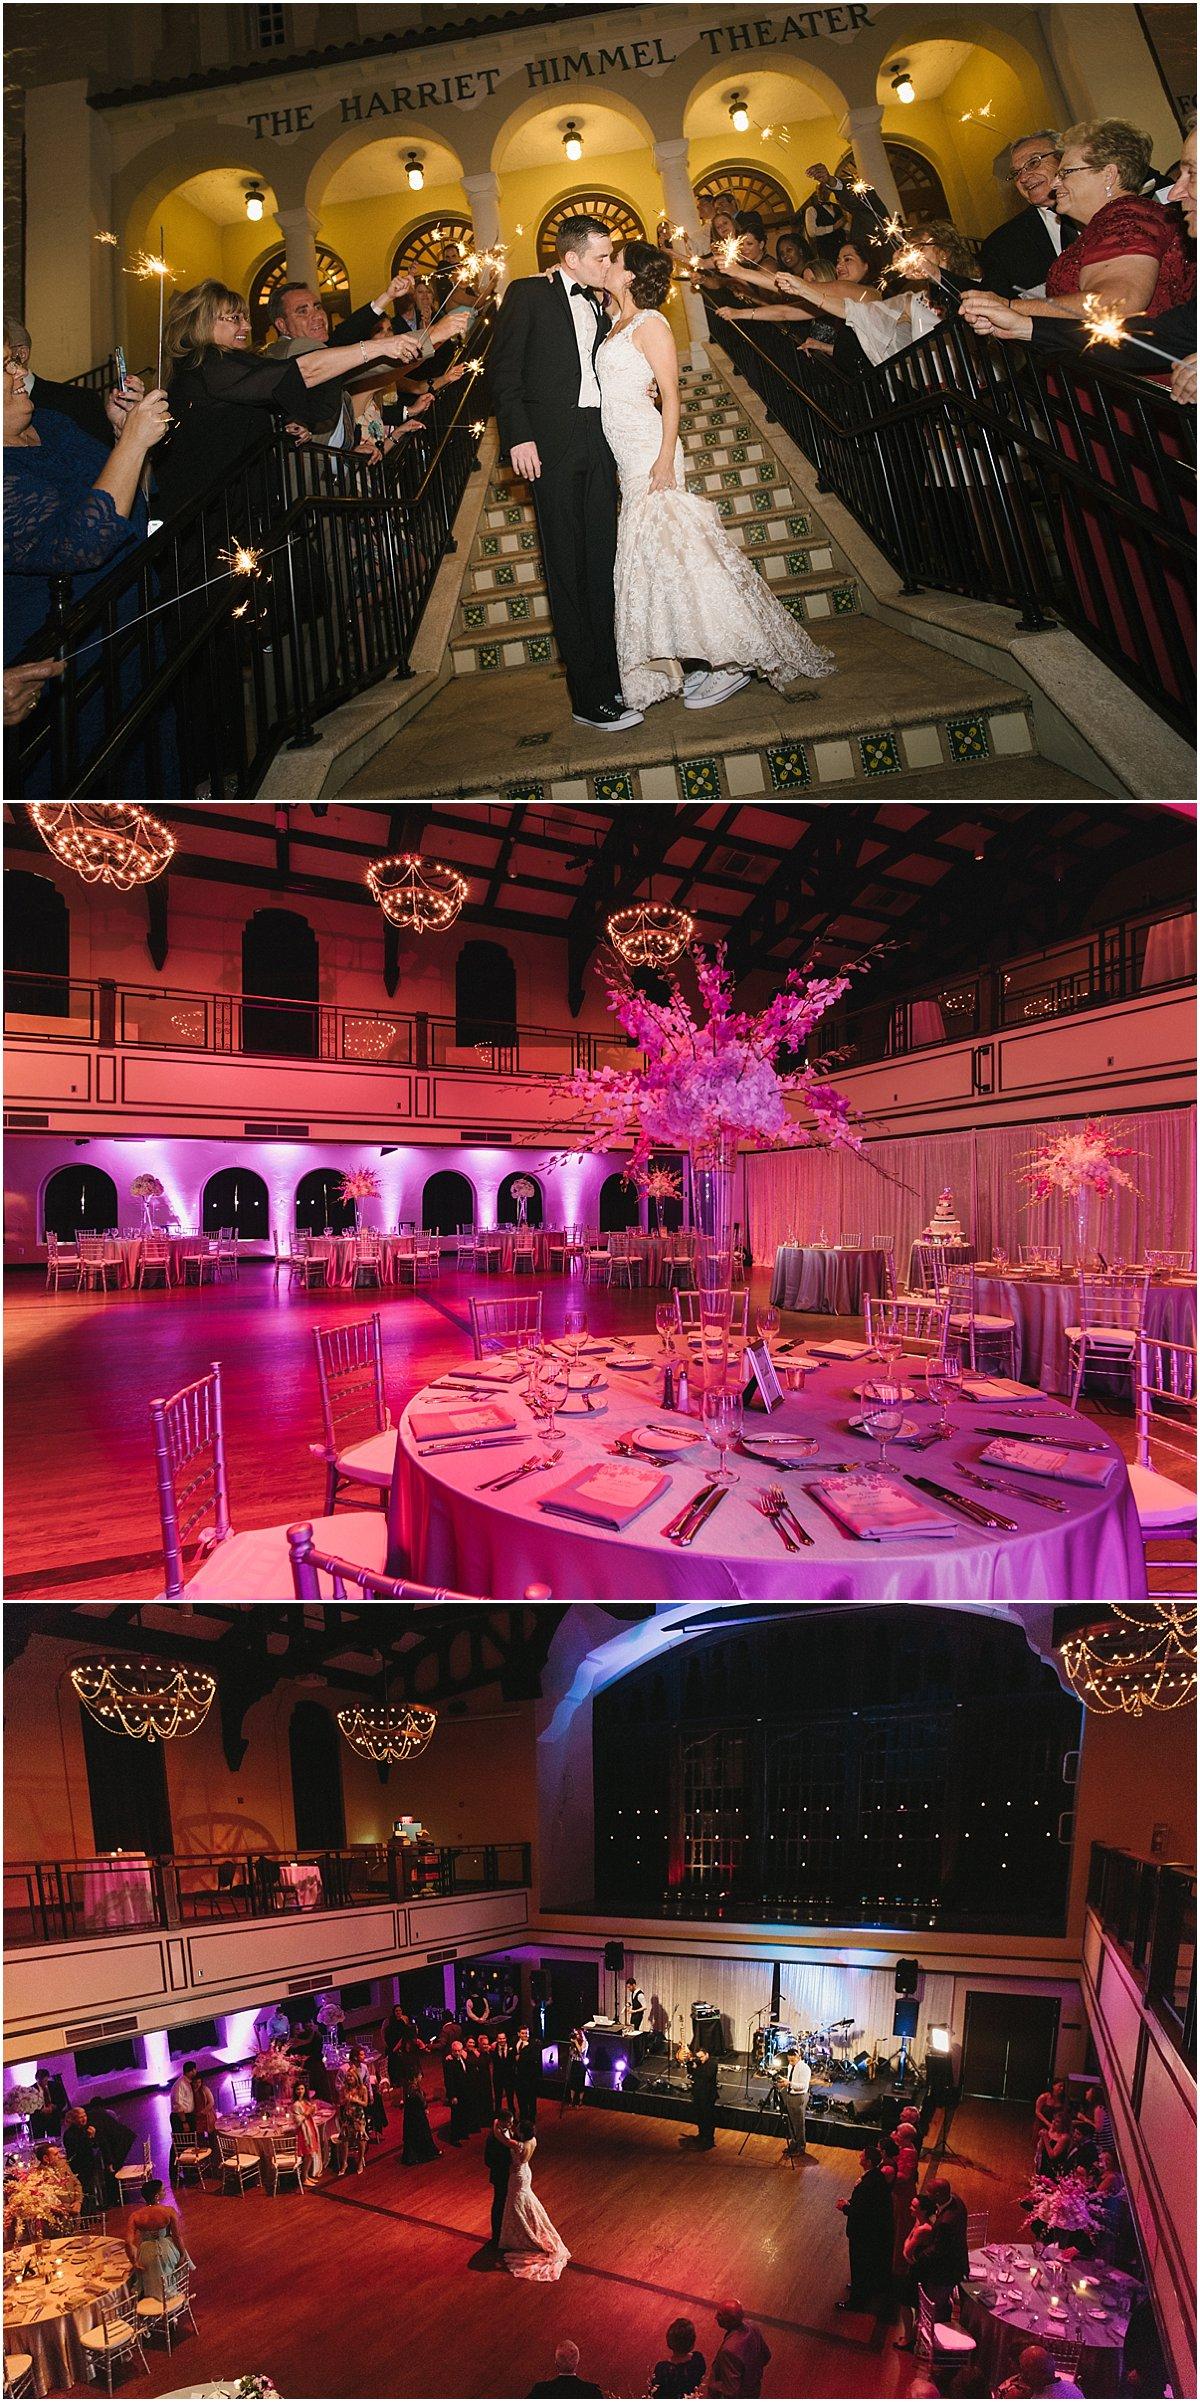 Palm Beach Wedding Venue_Harriet Himmel Theater_Robert Madrid Photography